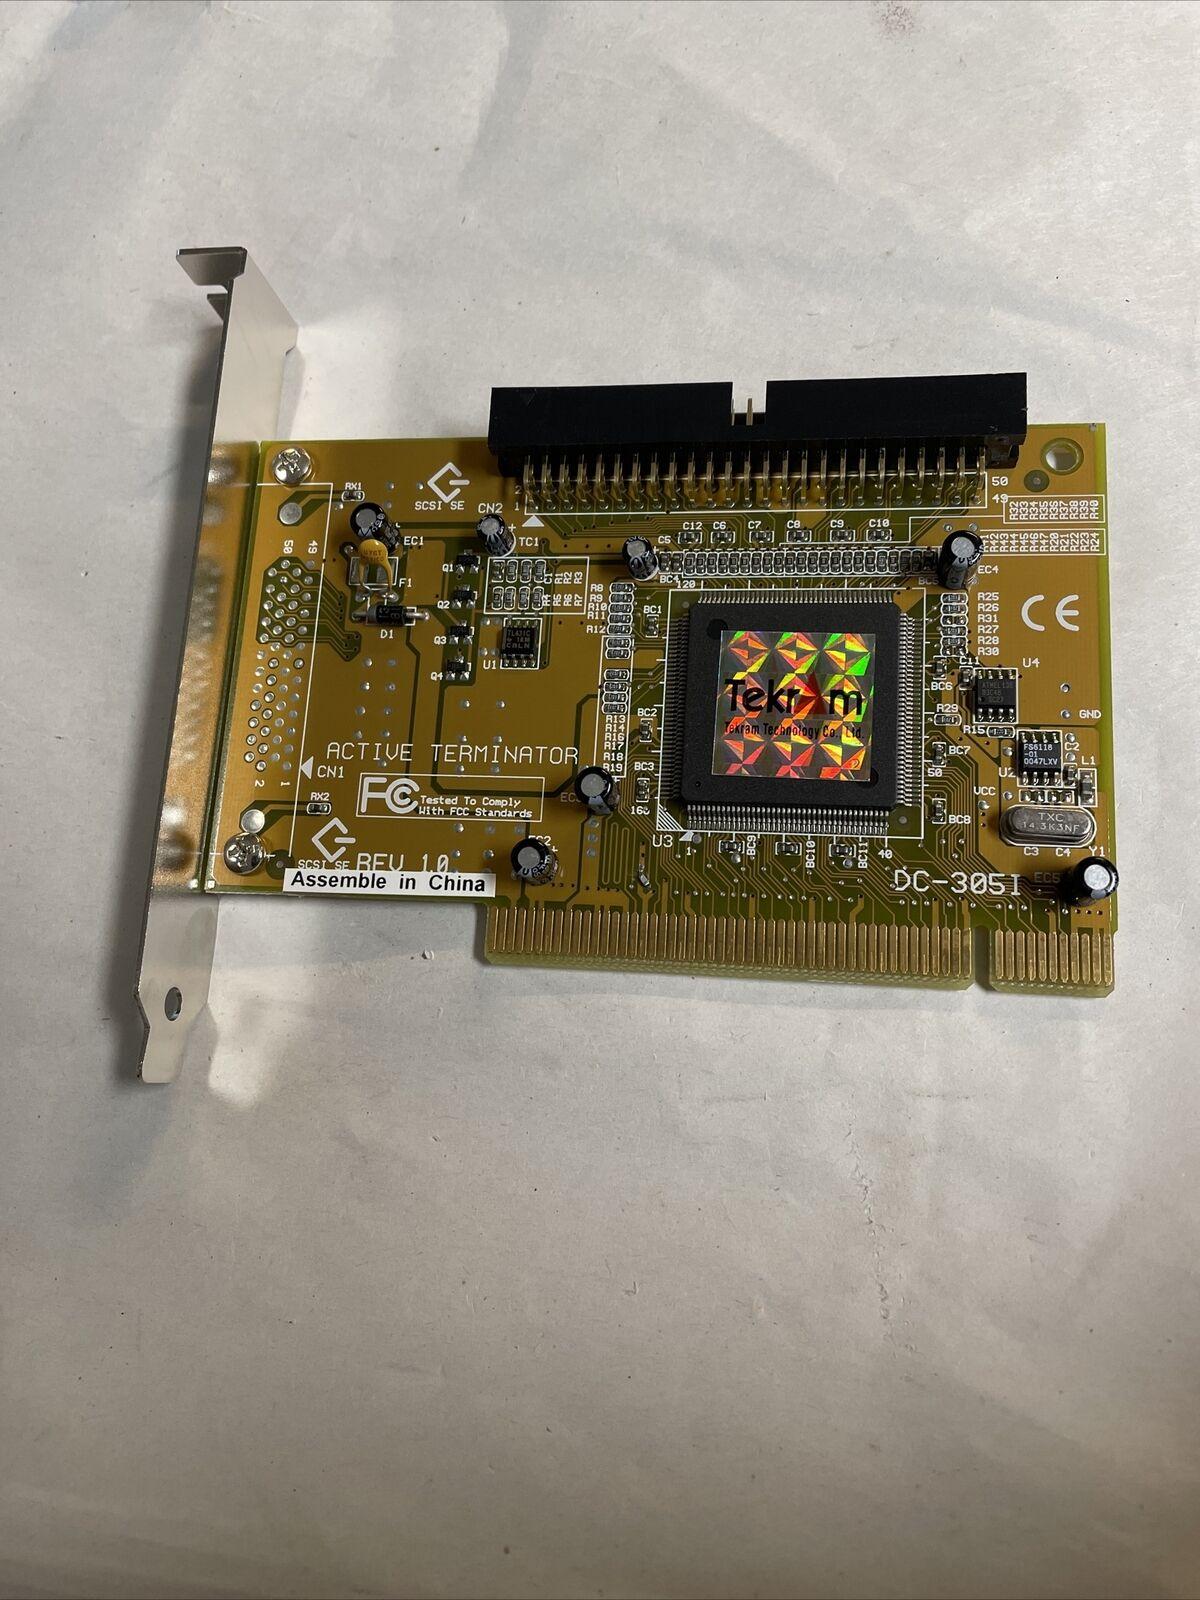 Tekram DC305I SCSI Active Terminator Controller Card 70-305001-00 @E